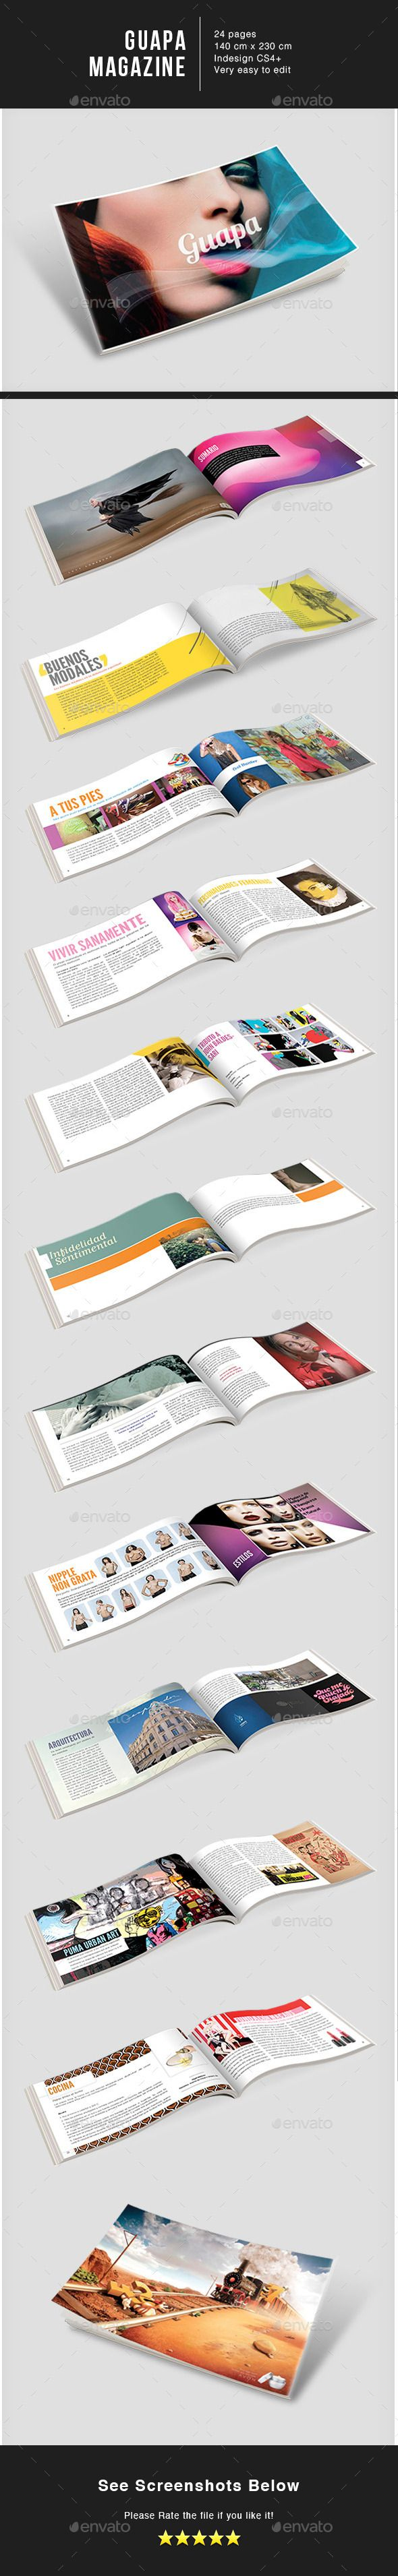 Guapa MGZ - #Magazines Print #Templates Download here: https://graphicriver.net/item/guapa-mgz/9170503?ref=alena994